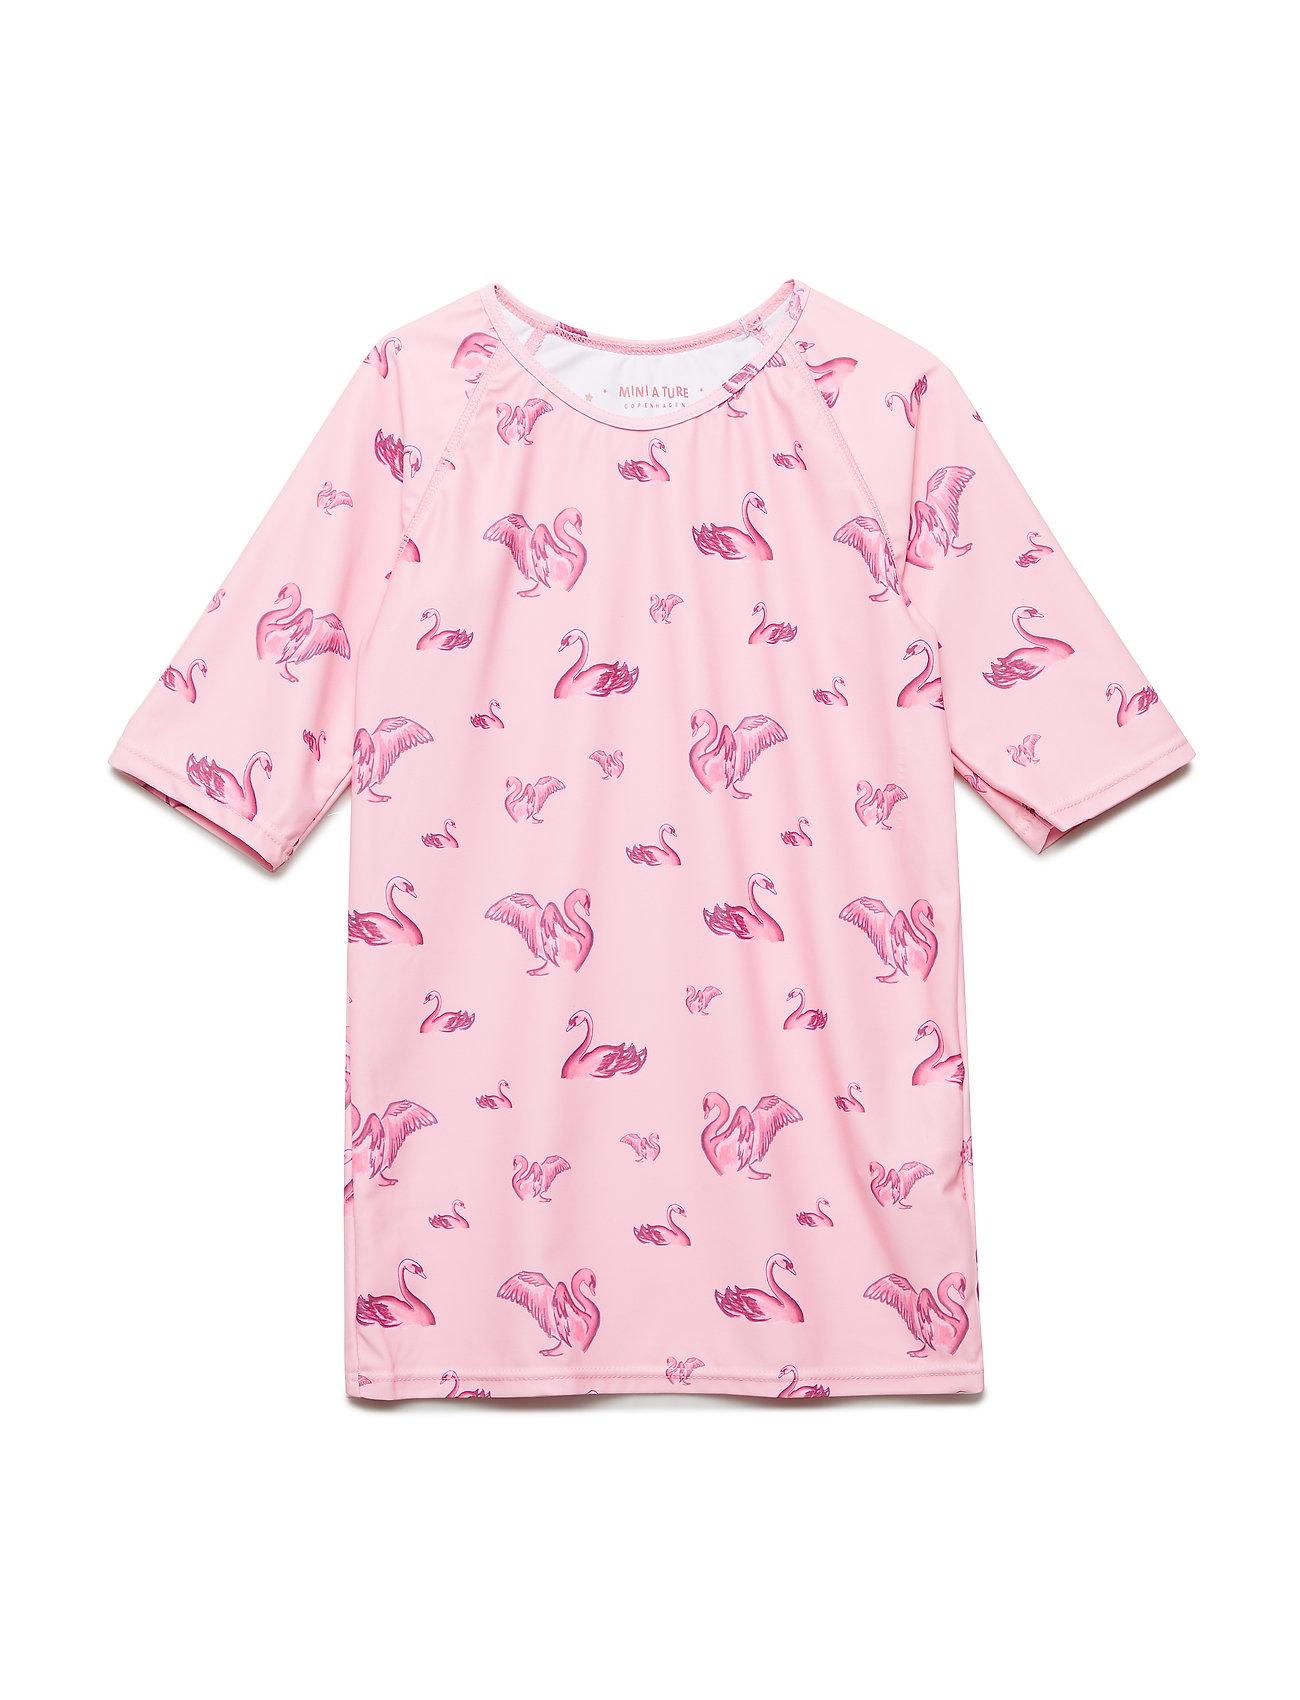 Mini A Ture Gun T-shirt, K